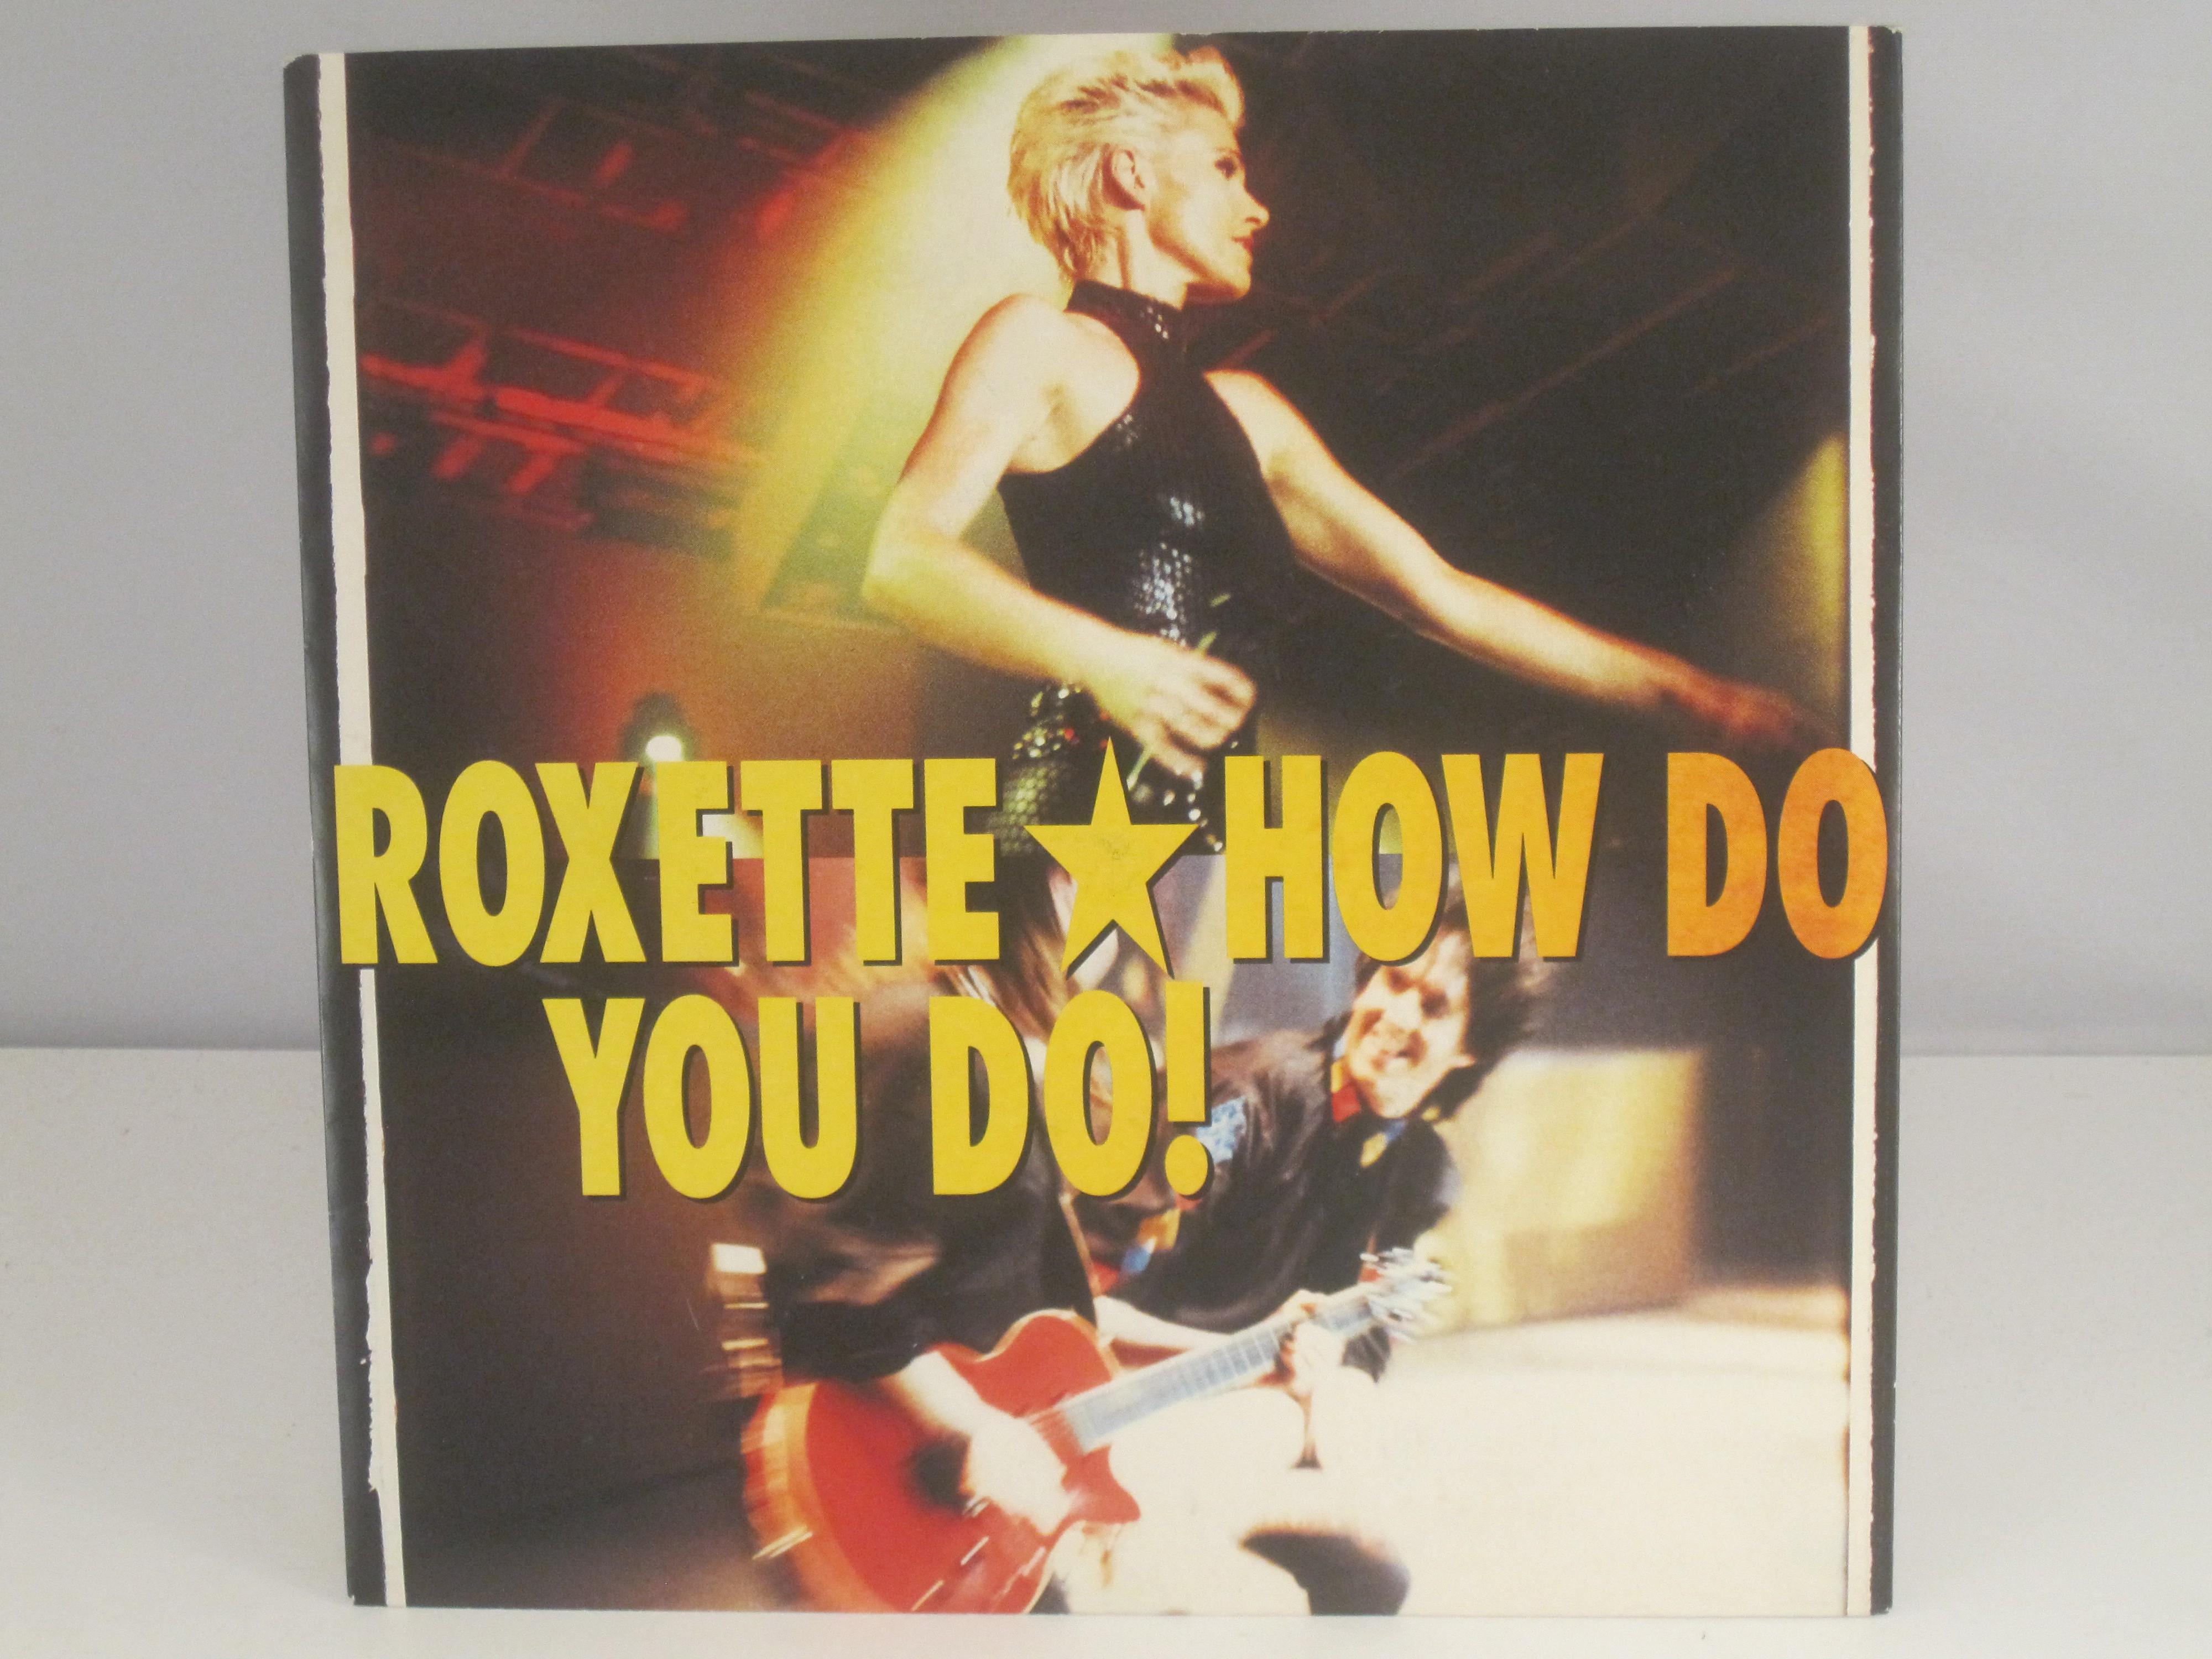 ROXETTE : How do you do! / Fading like a flower